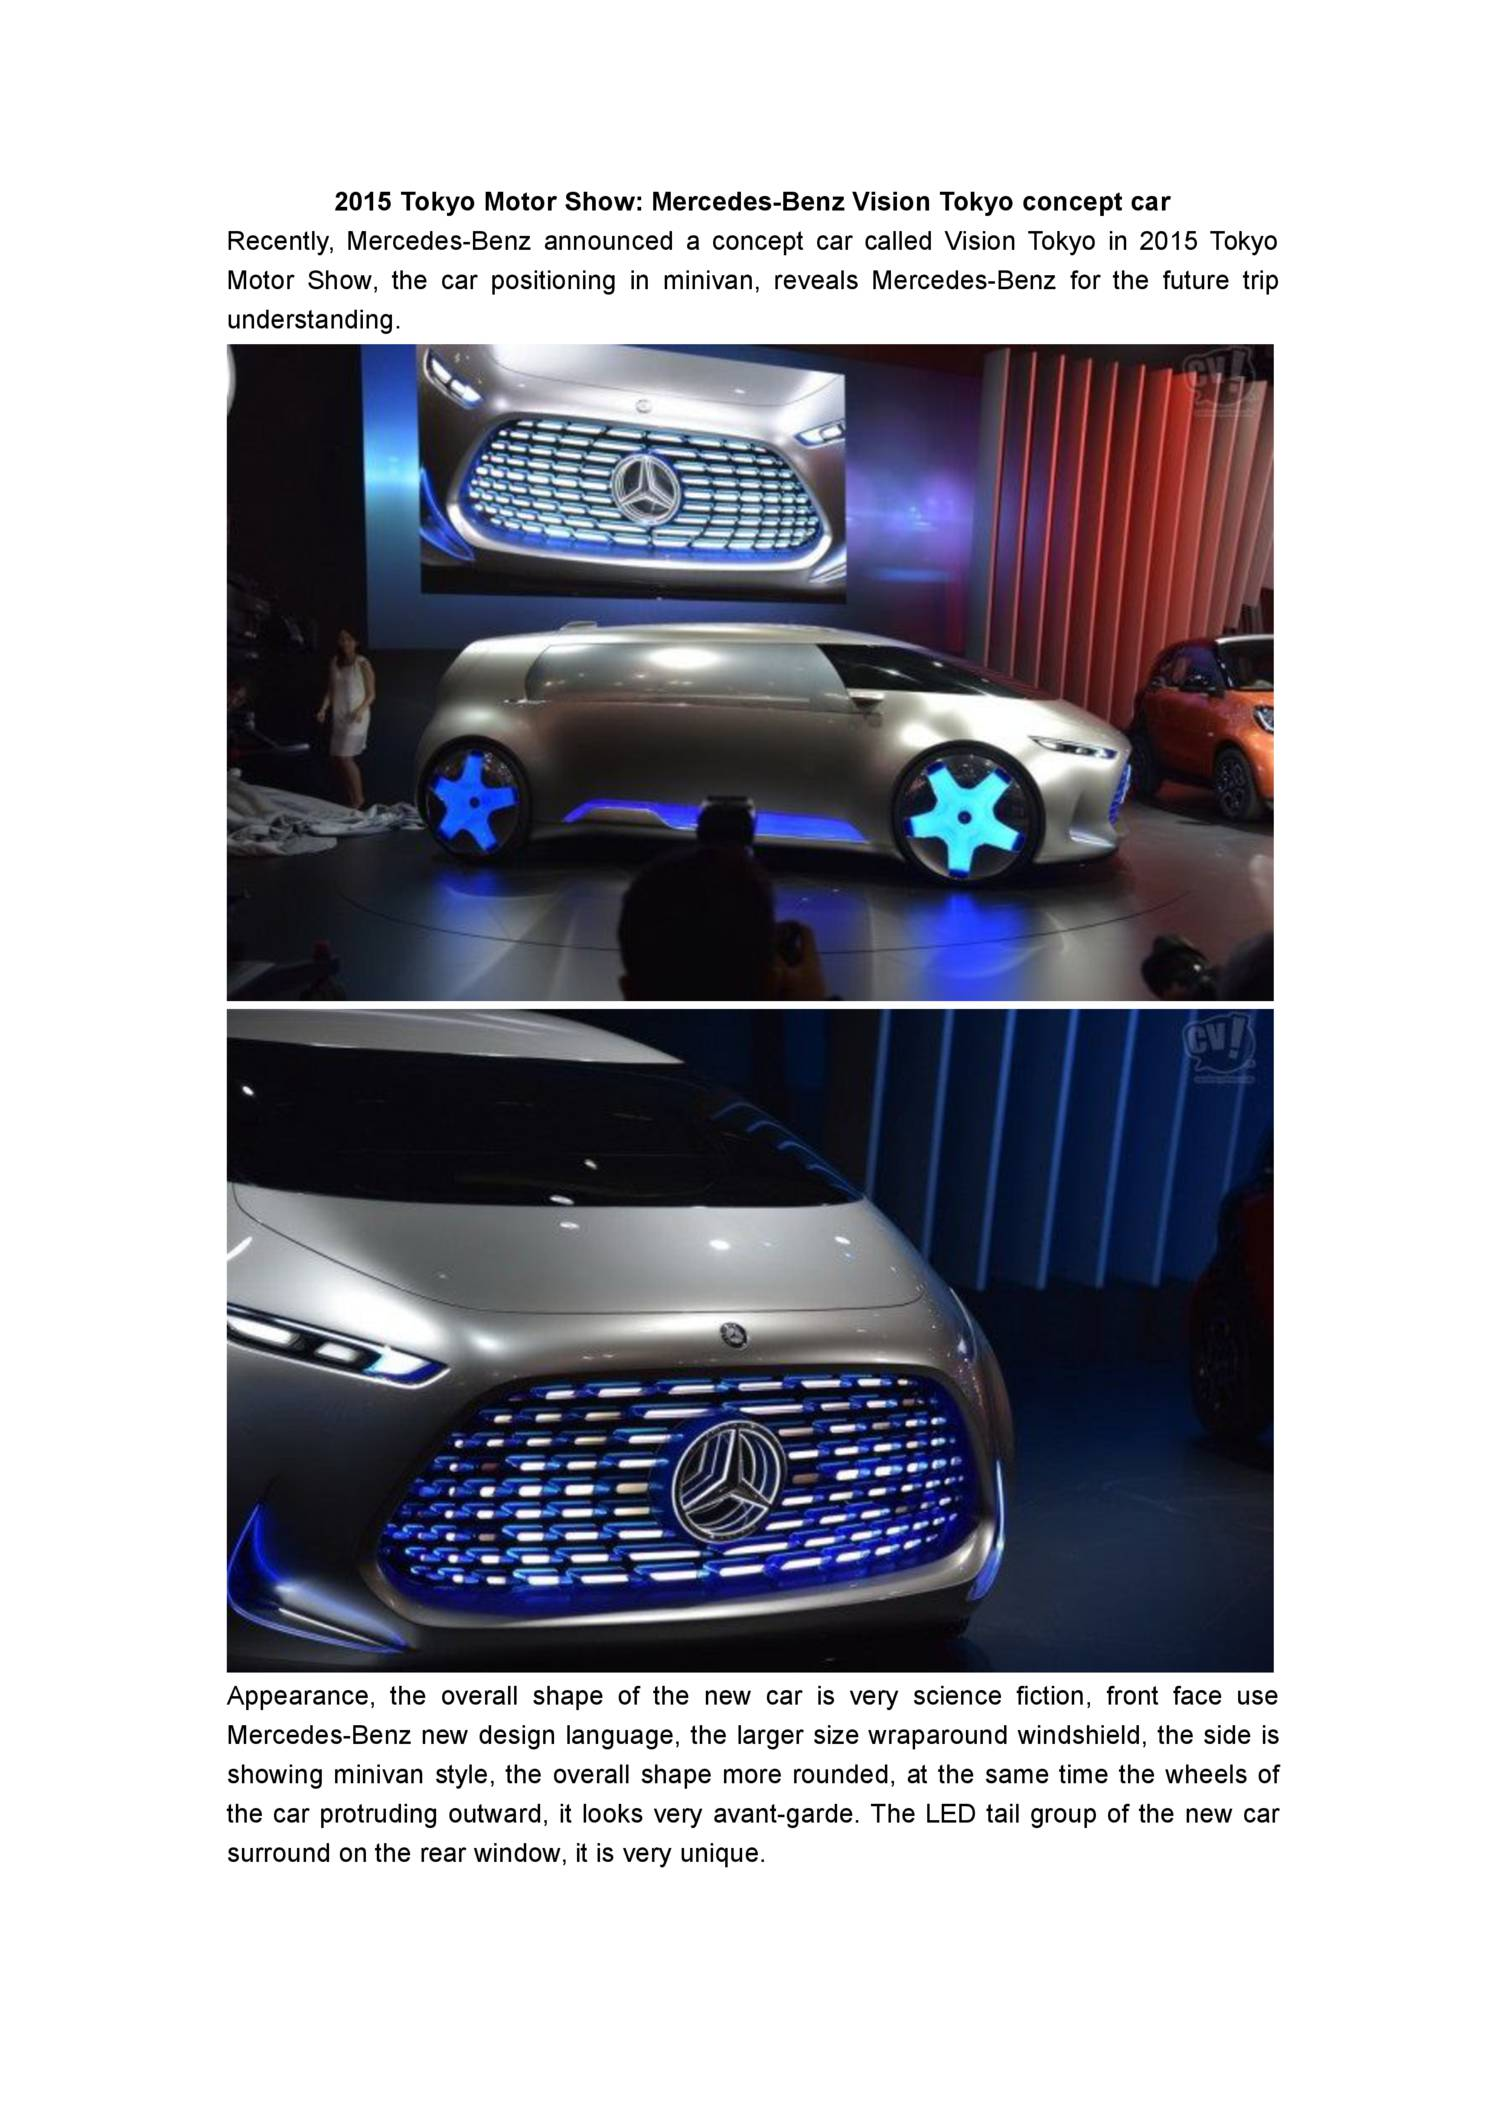 https://www.docdroid.net/file/view/hpR4m5y/2015-tokyo-motor-show-mercedes-benz-vision-tokyo-concept.jpg